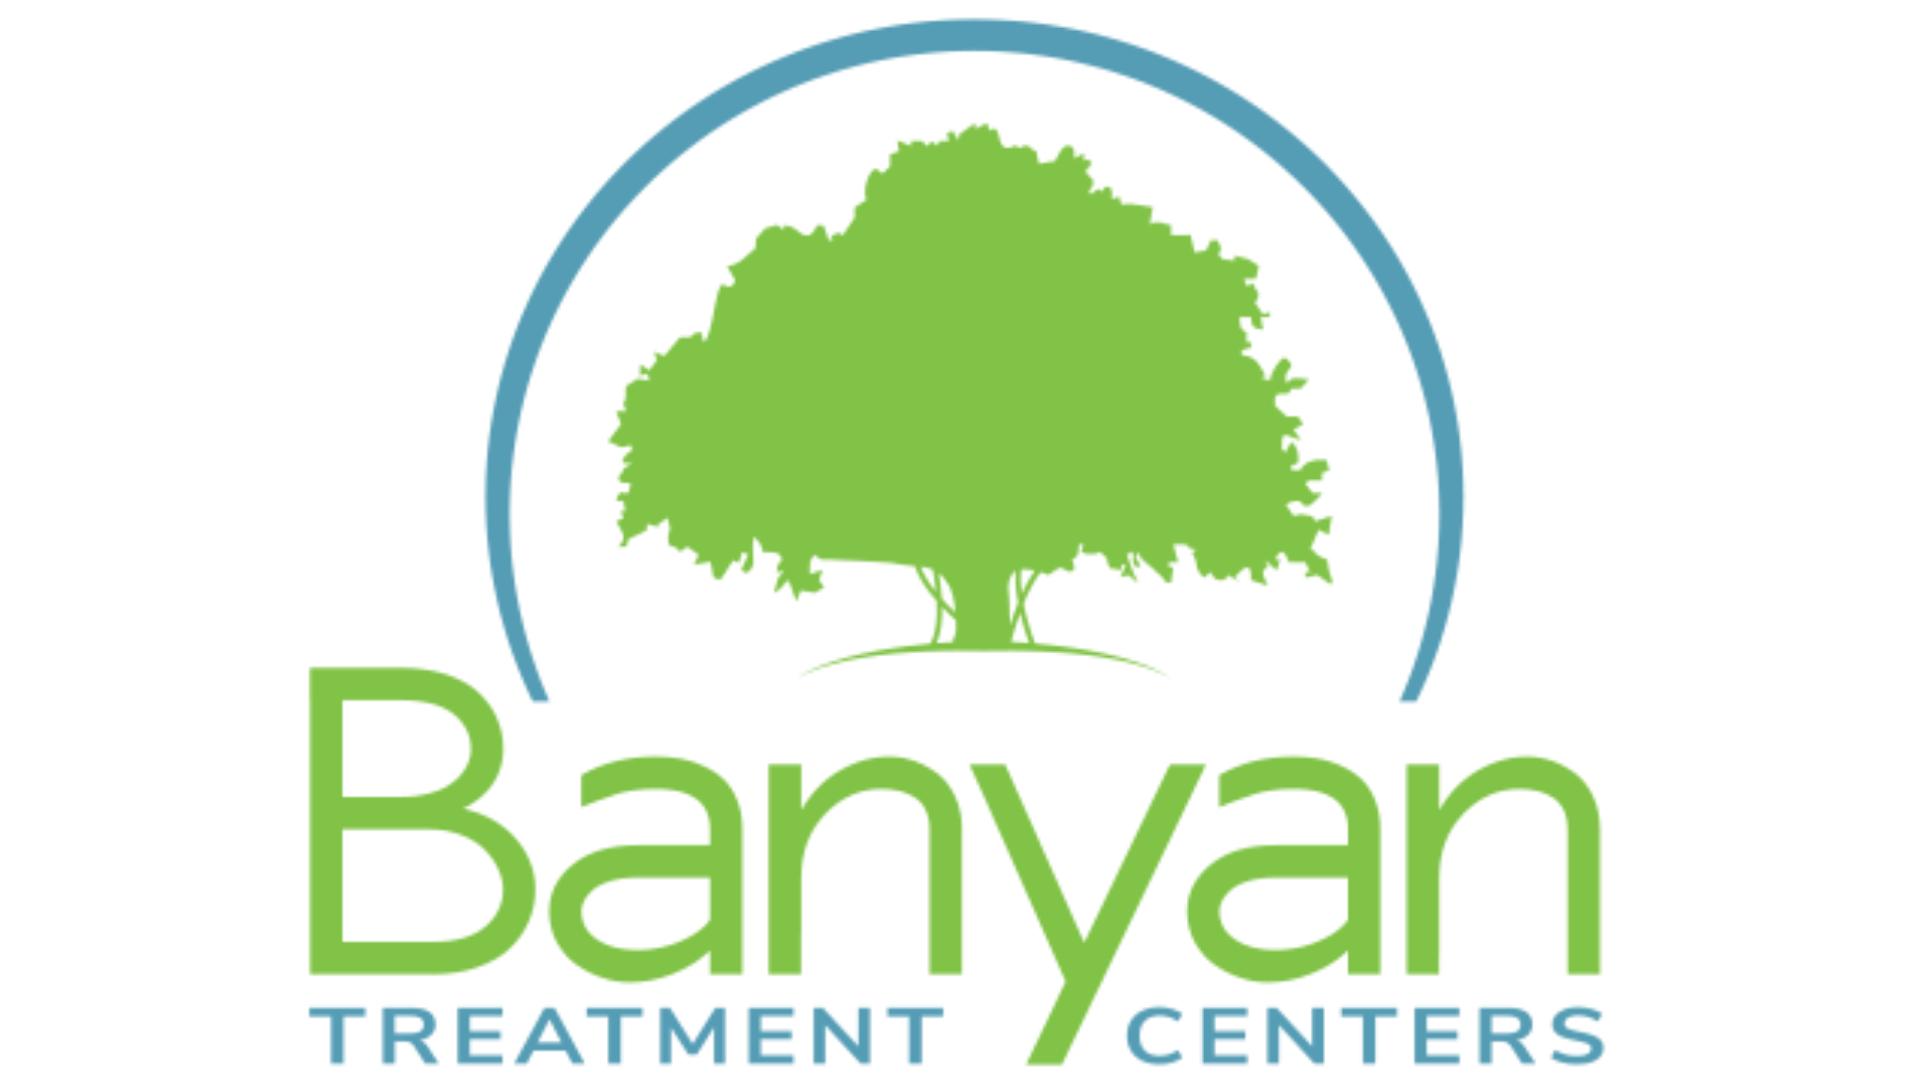 Banyan Treatment Centers